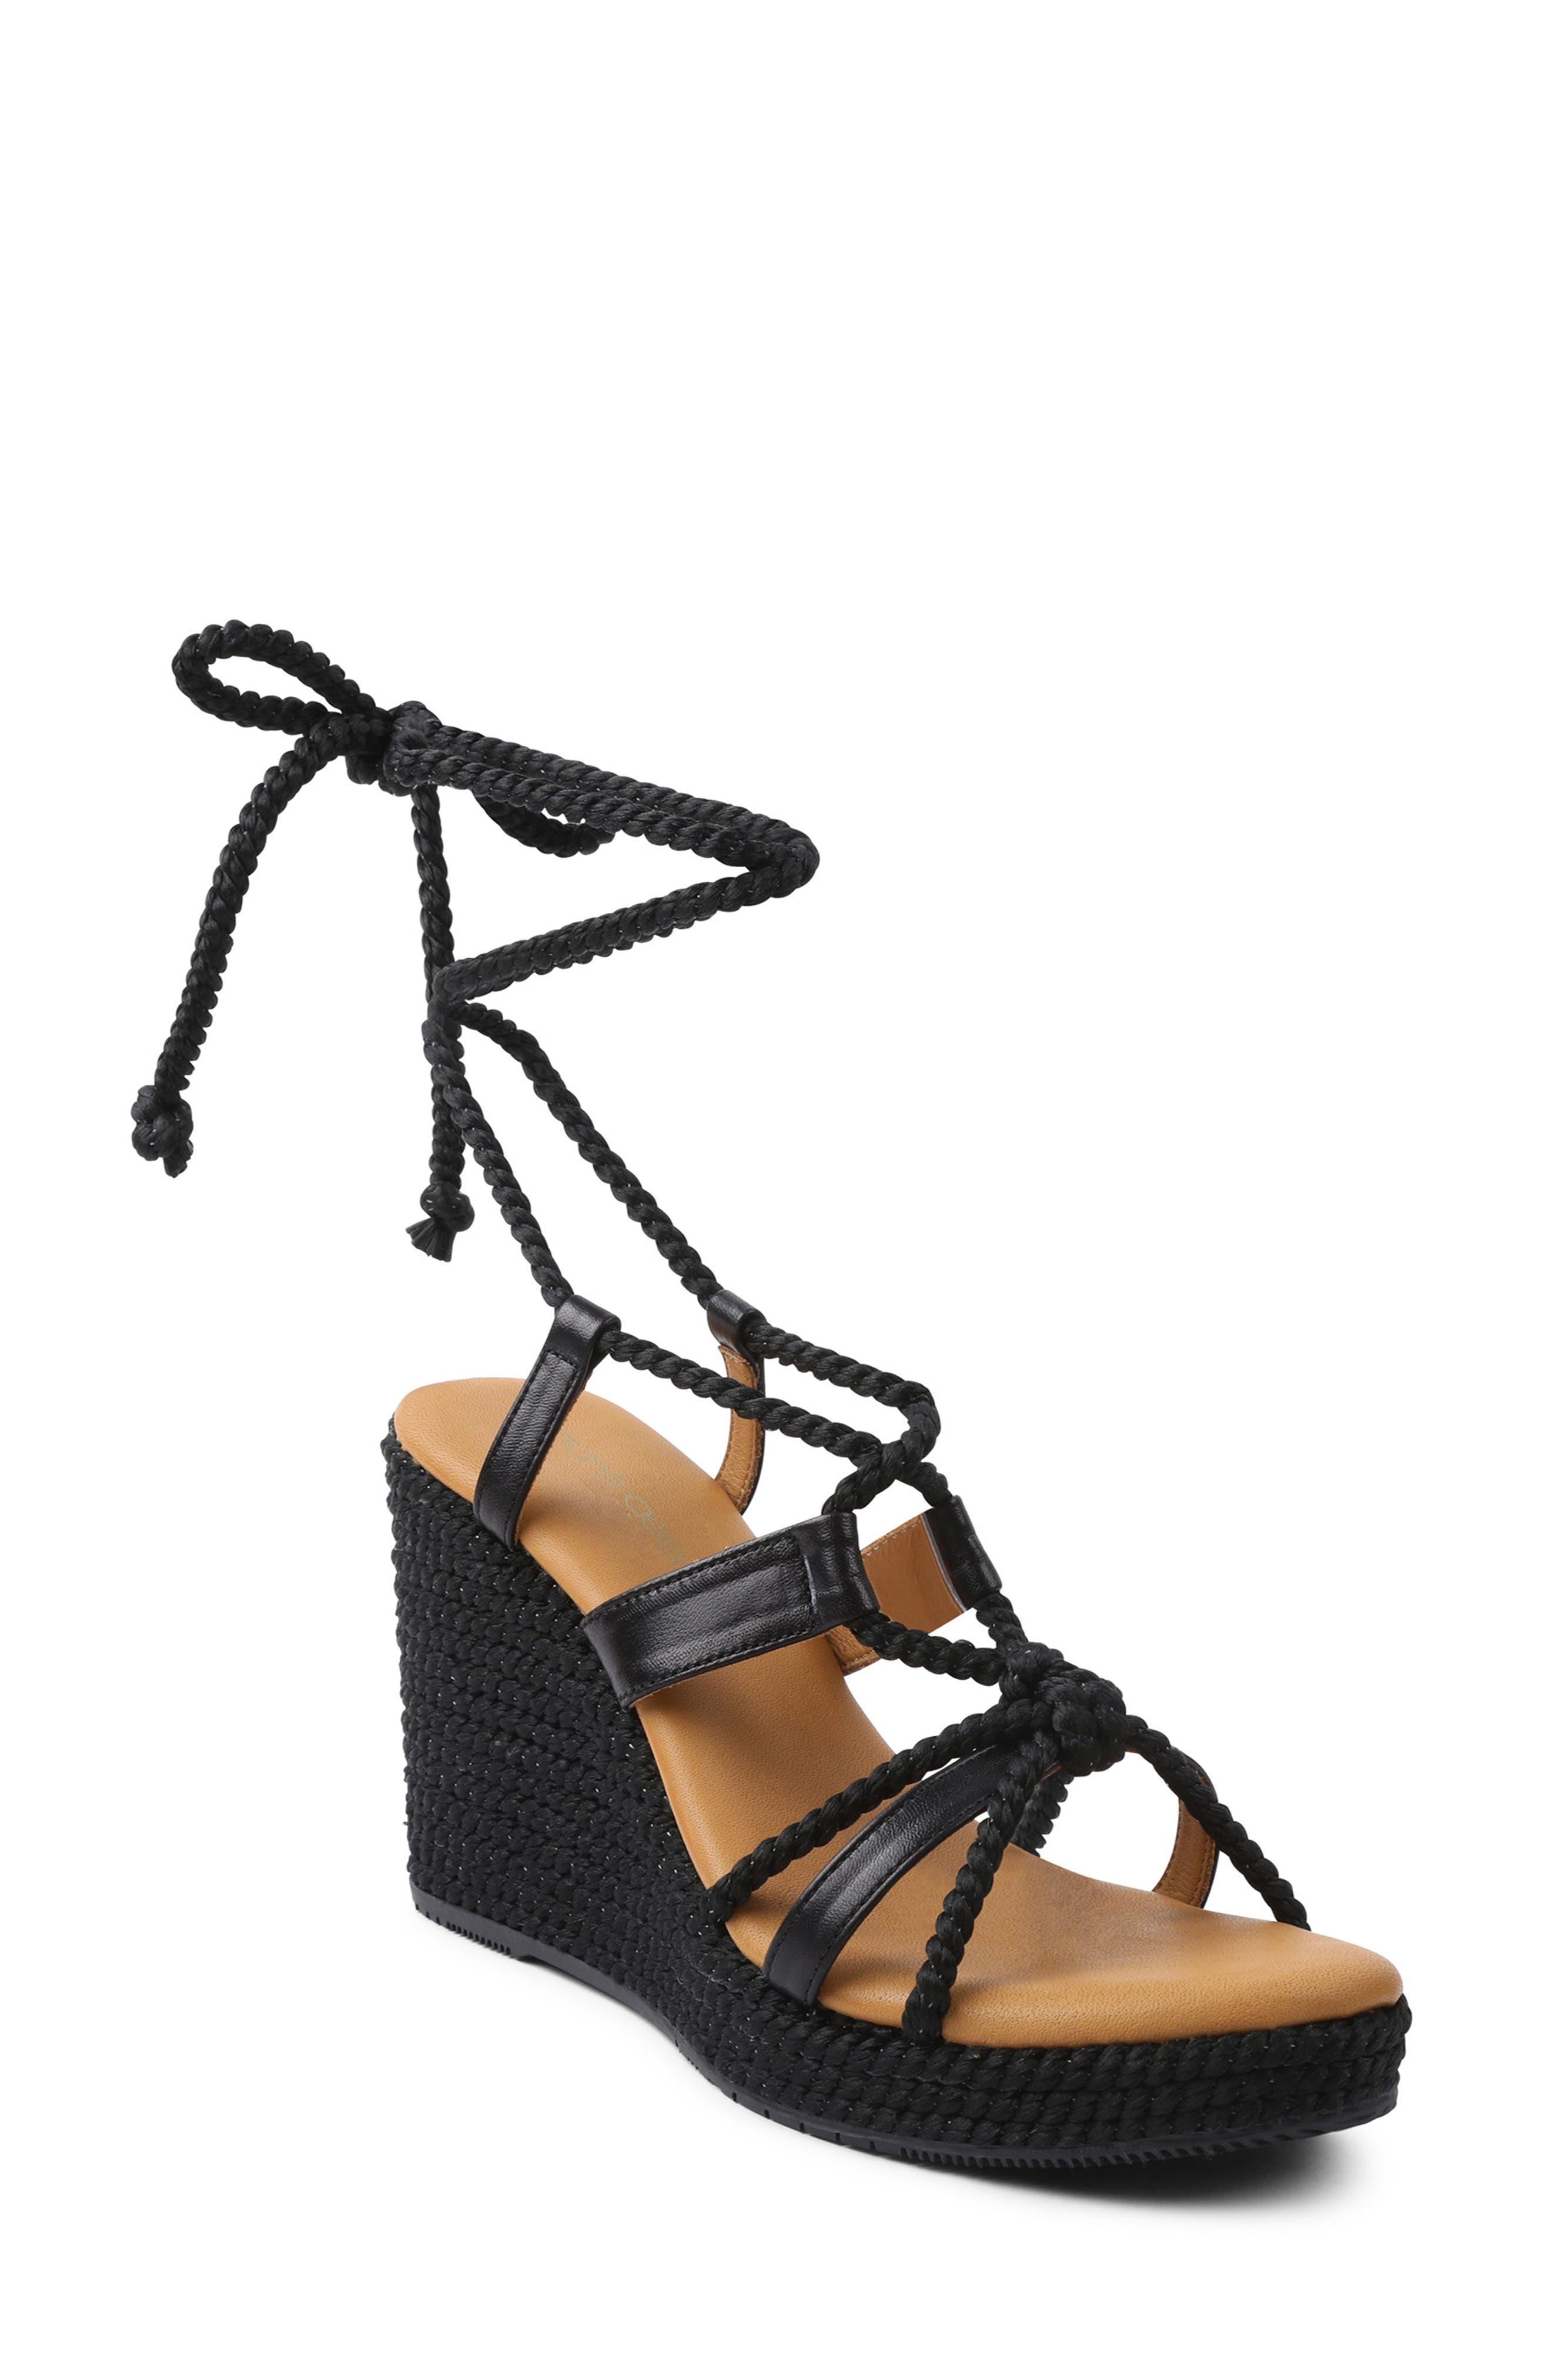 Ash Wedge Sandal